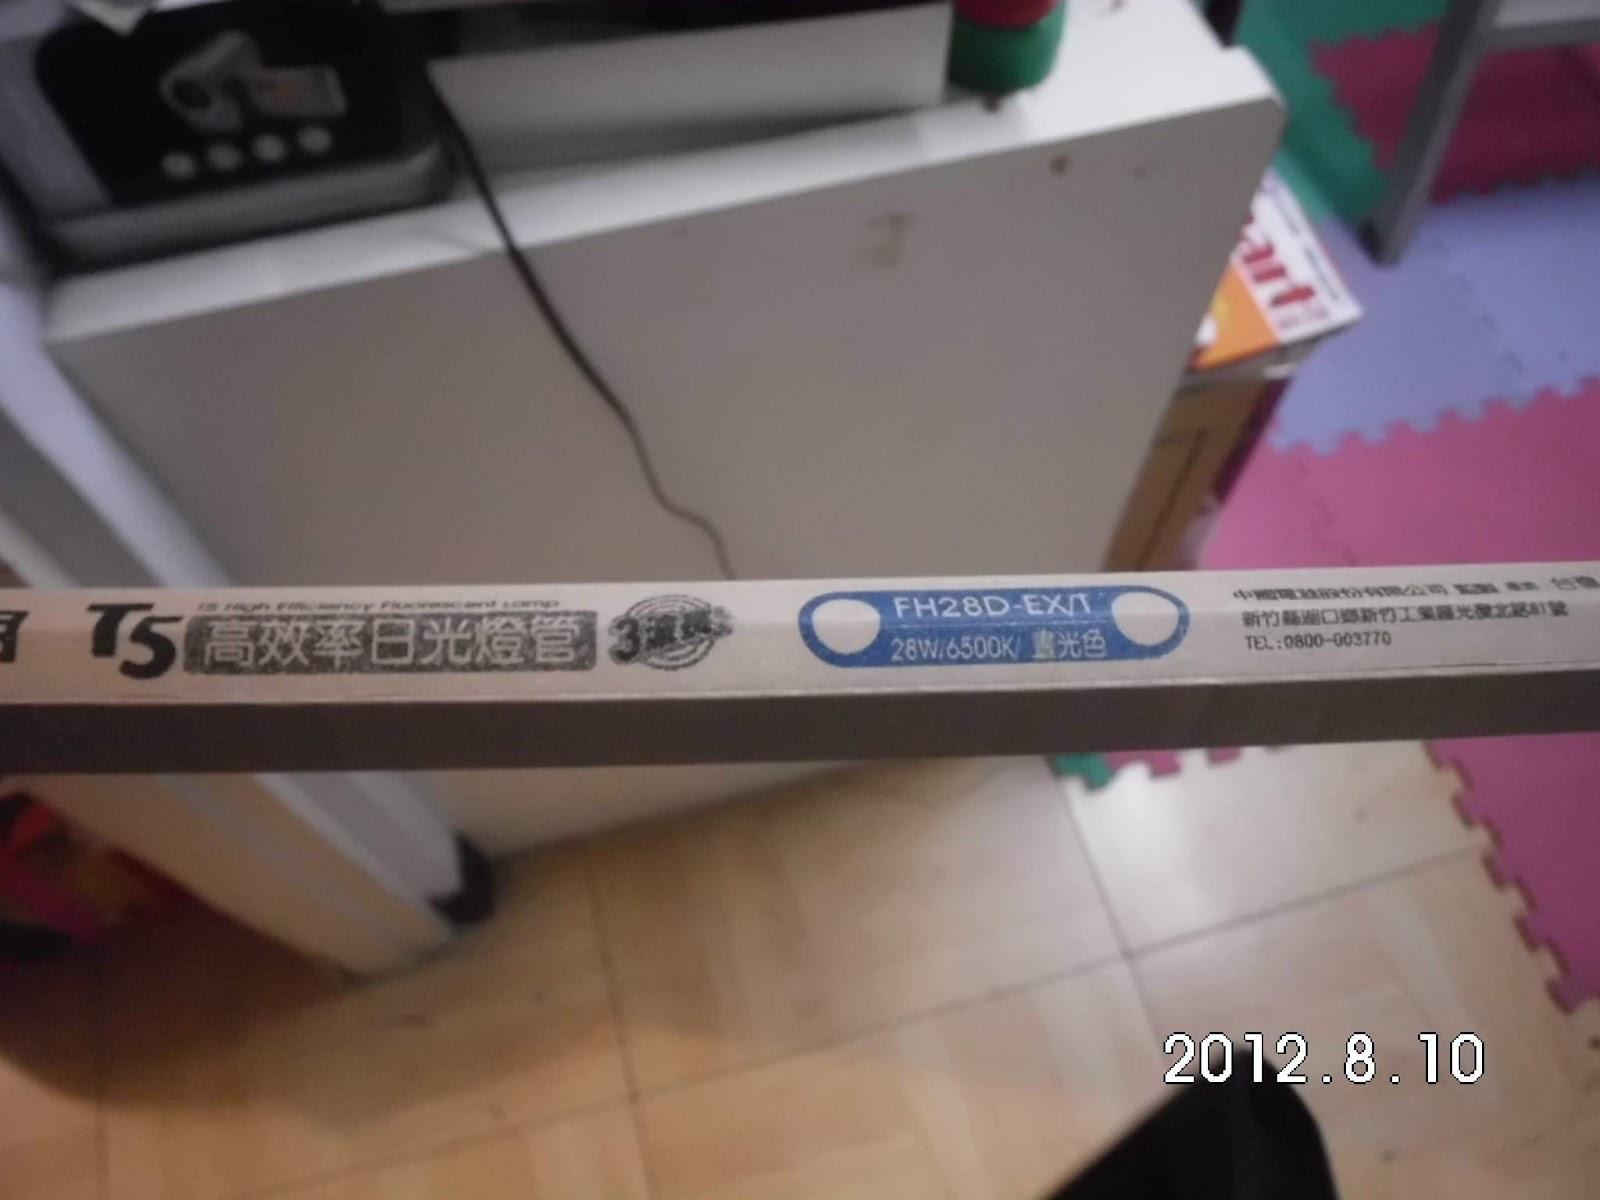 jm 明の部落格 (Blog): 8/10 DIY更換T5 28W雙燈管